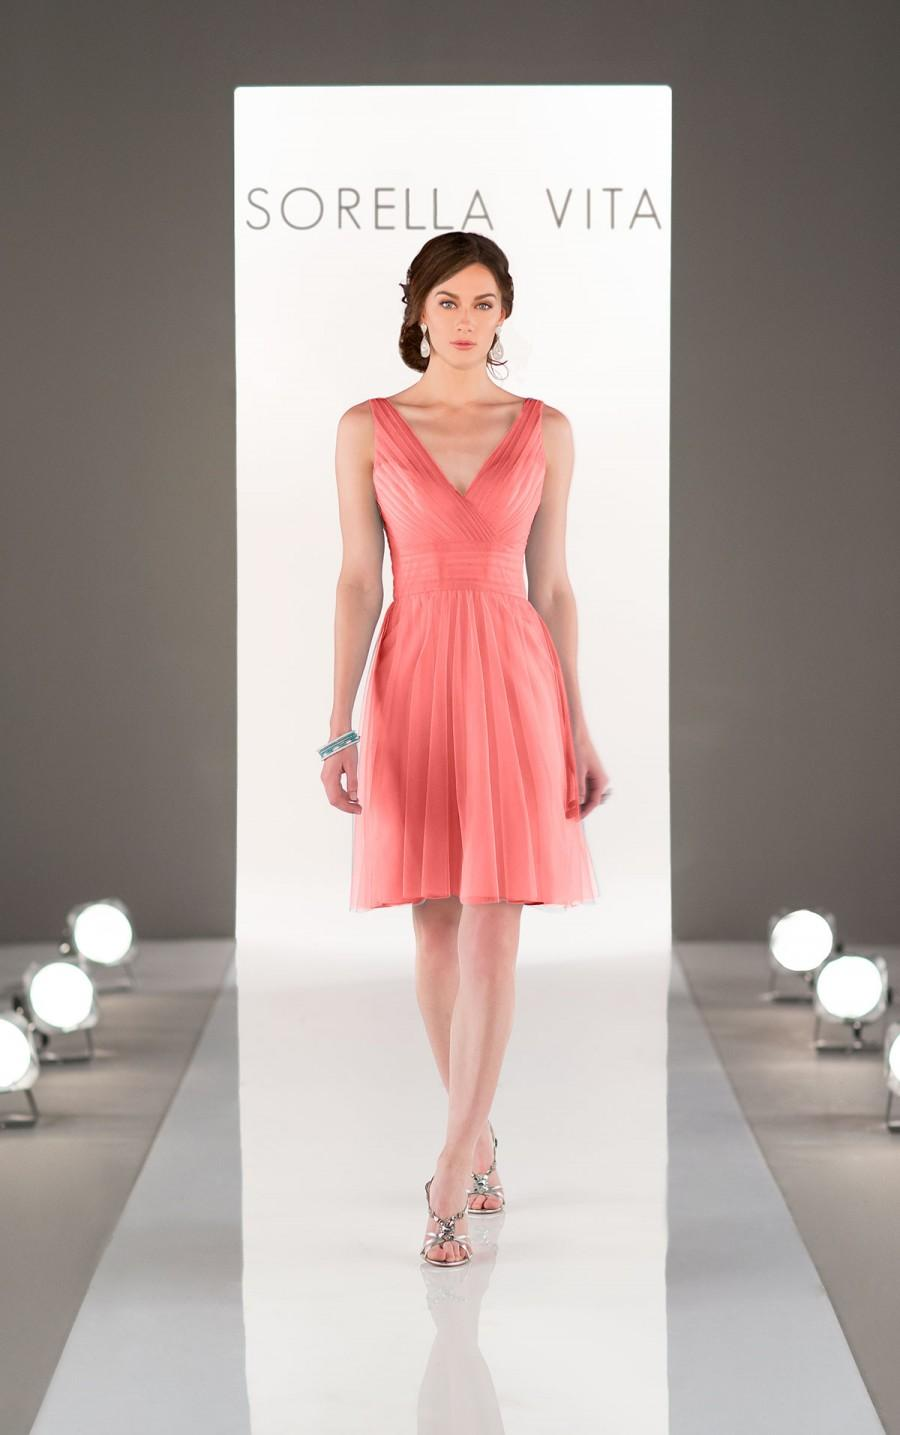 Wedding - Sorella Vita Tulle Bridesmaid Dress Style 8701